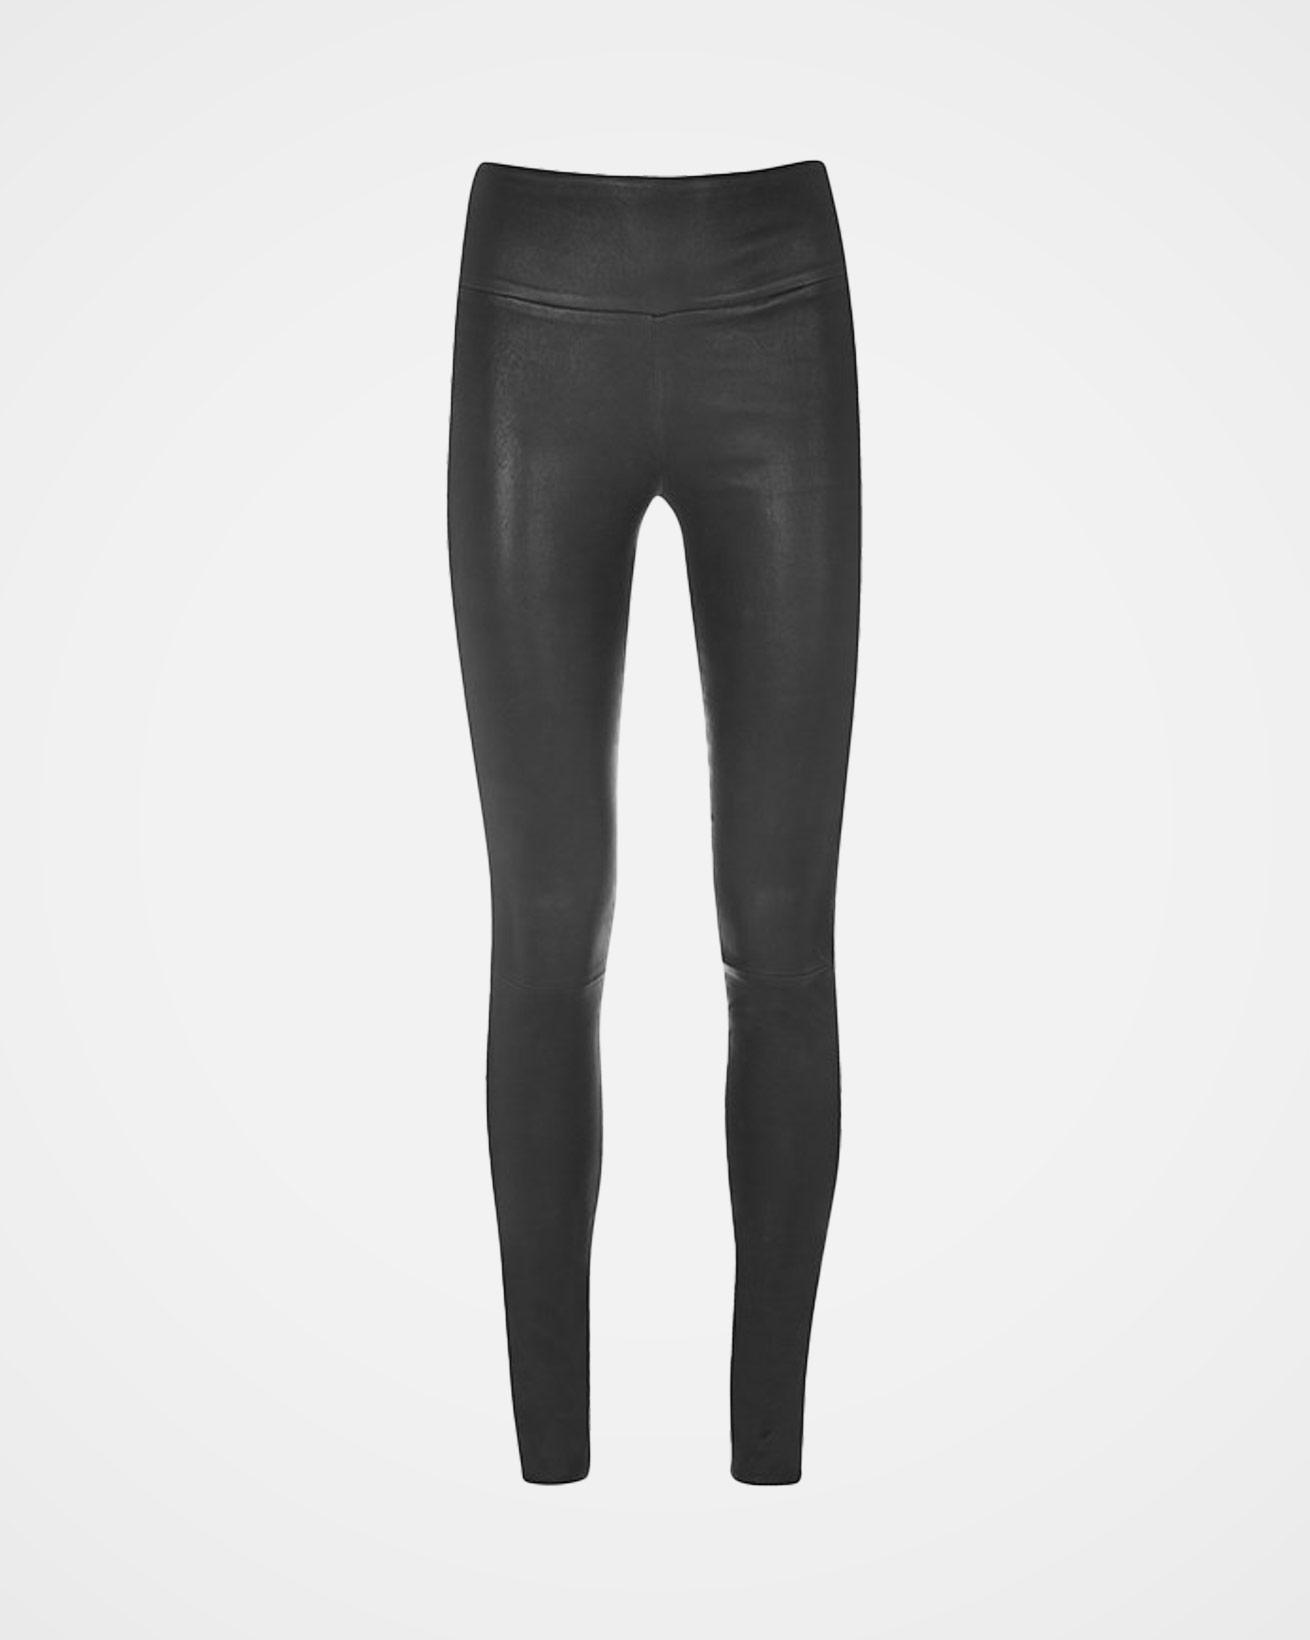 6883_stretch-leather-legging_black_front.jpg